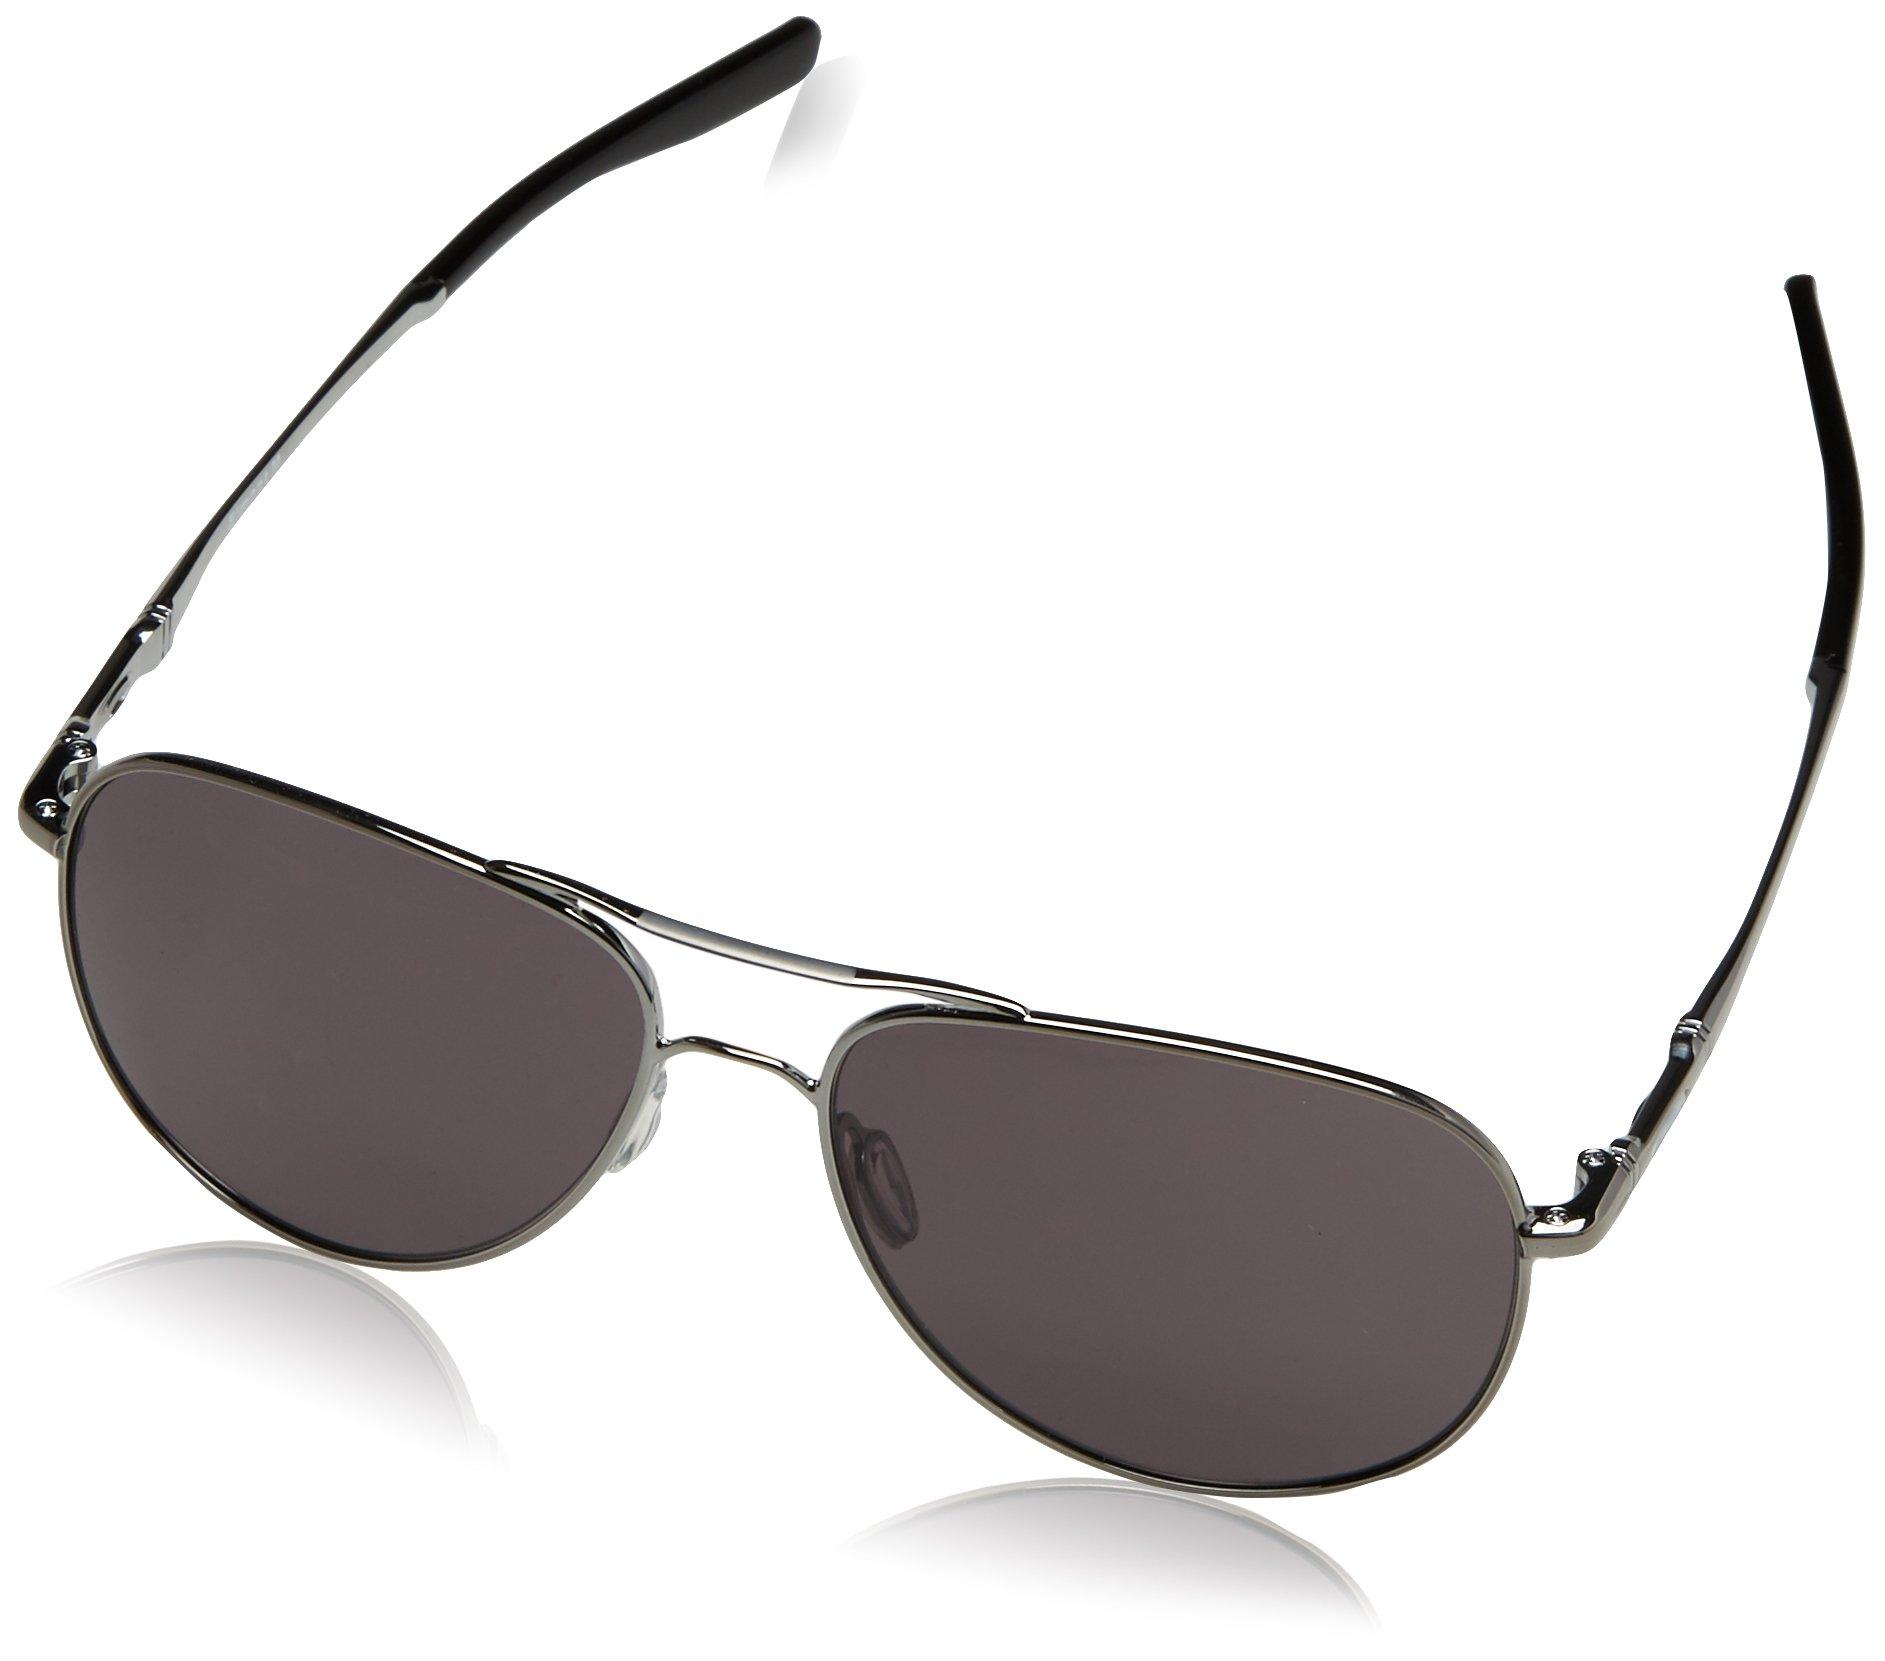 Oakley Men's Elmont M Sunglasses,Gunmetal/Warm